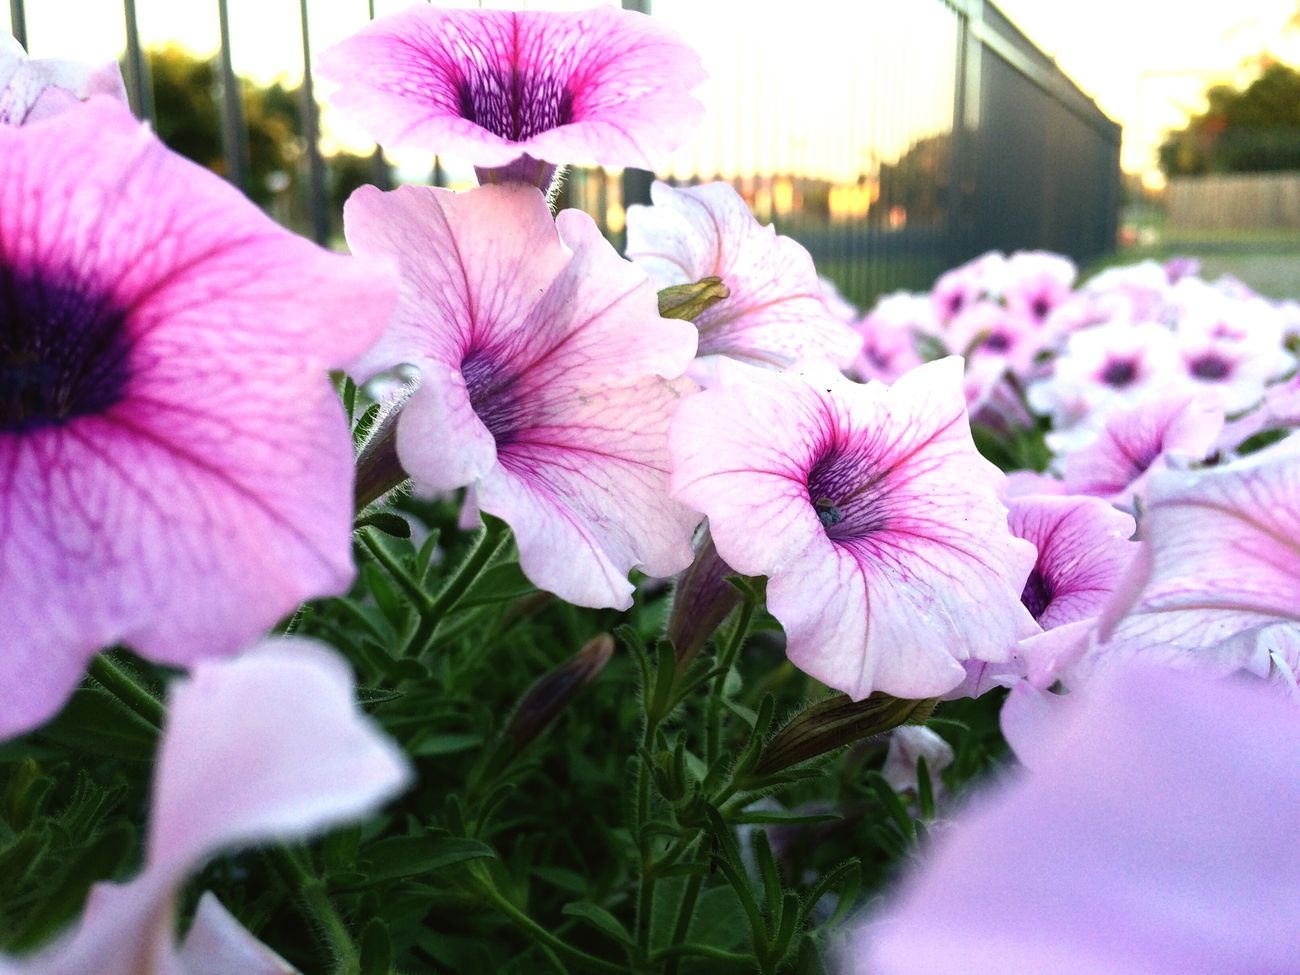 Flowers Likethis